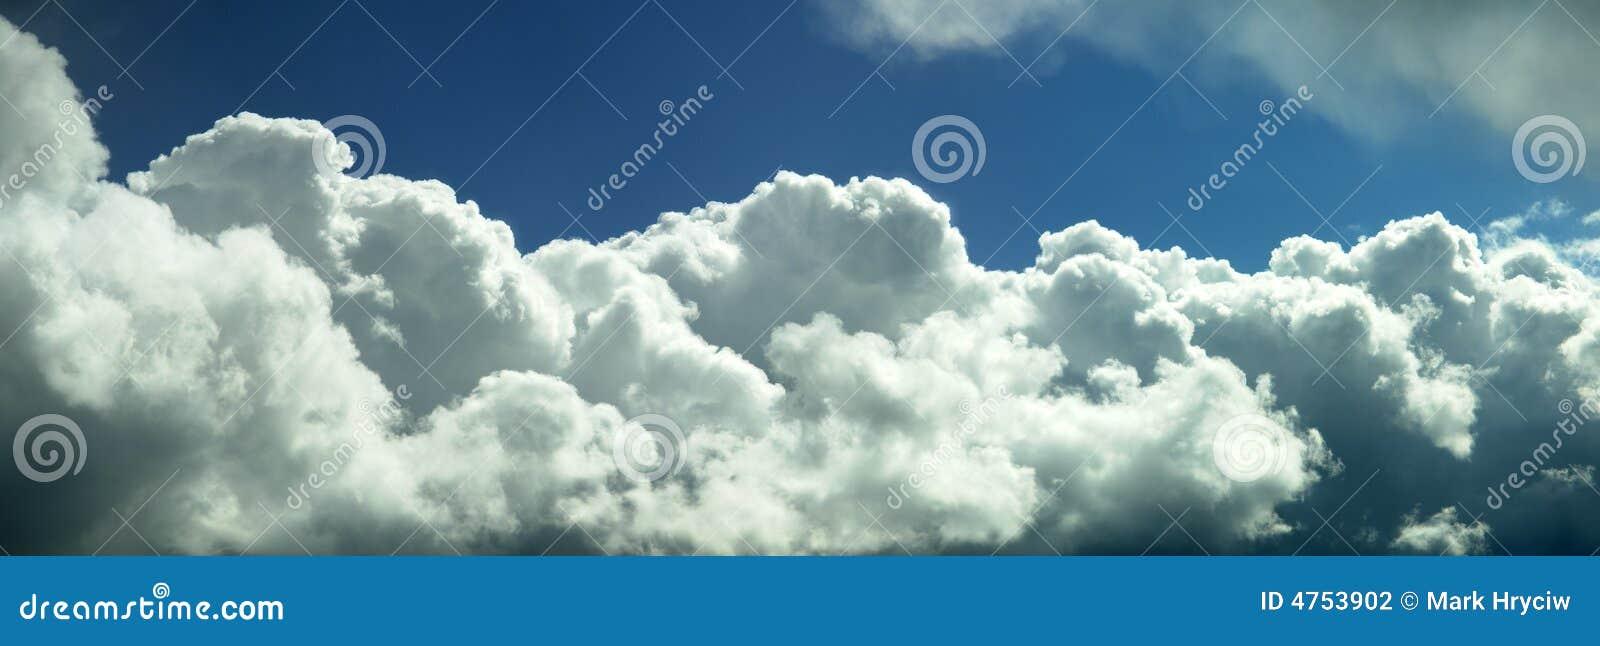 Panorama mullido blanco de las nubes